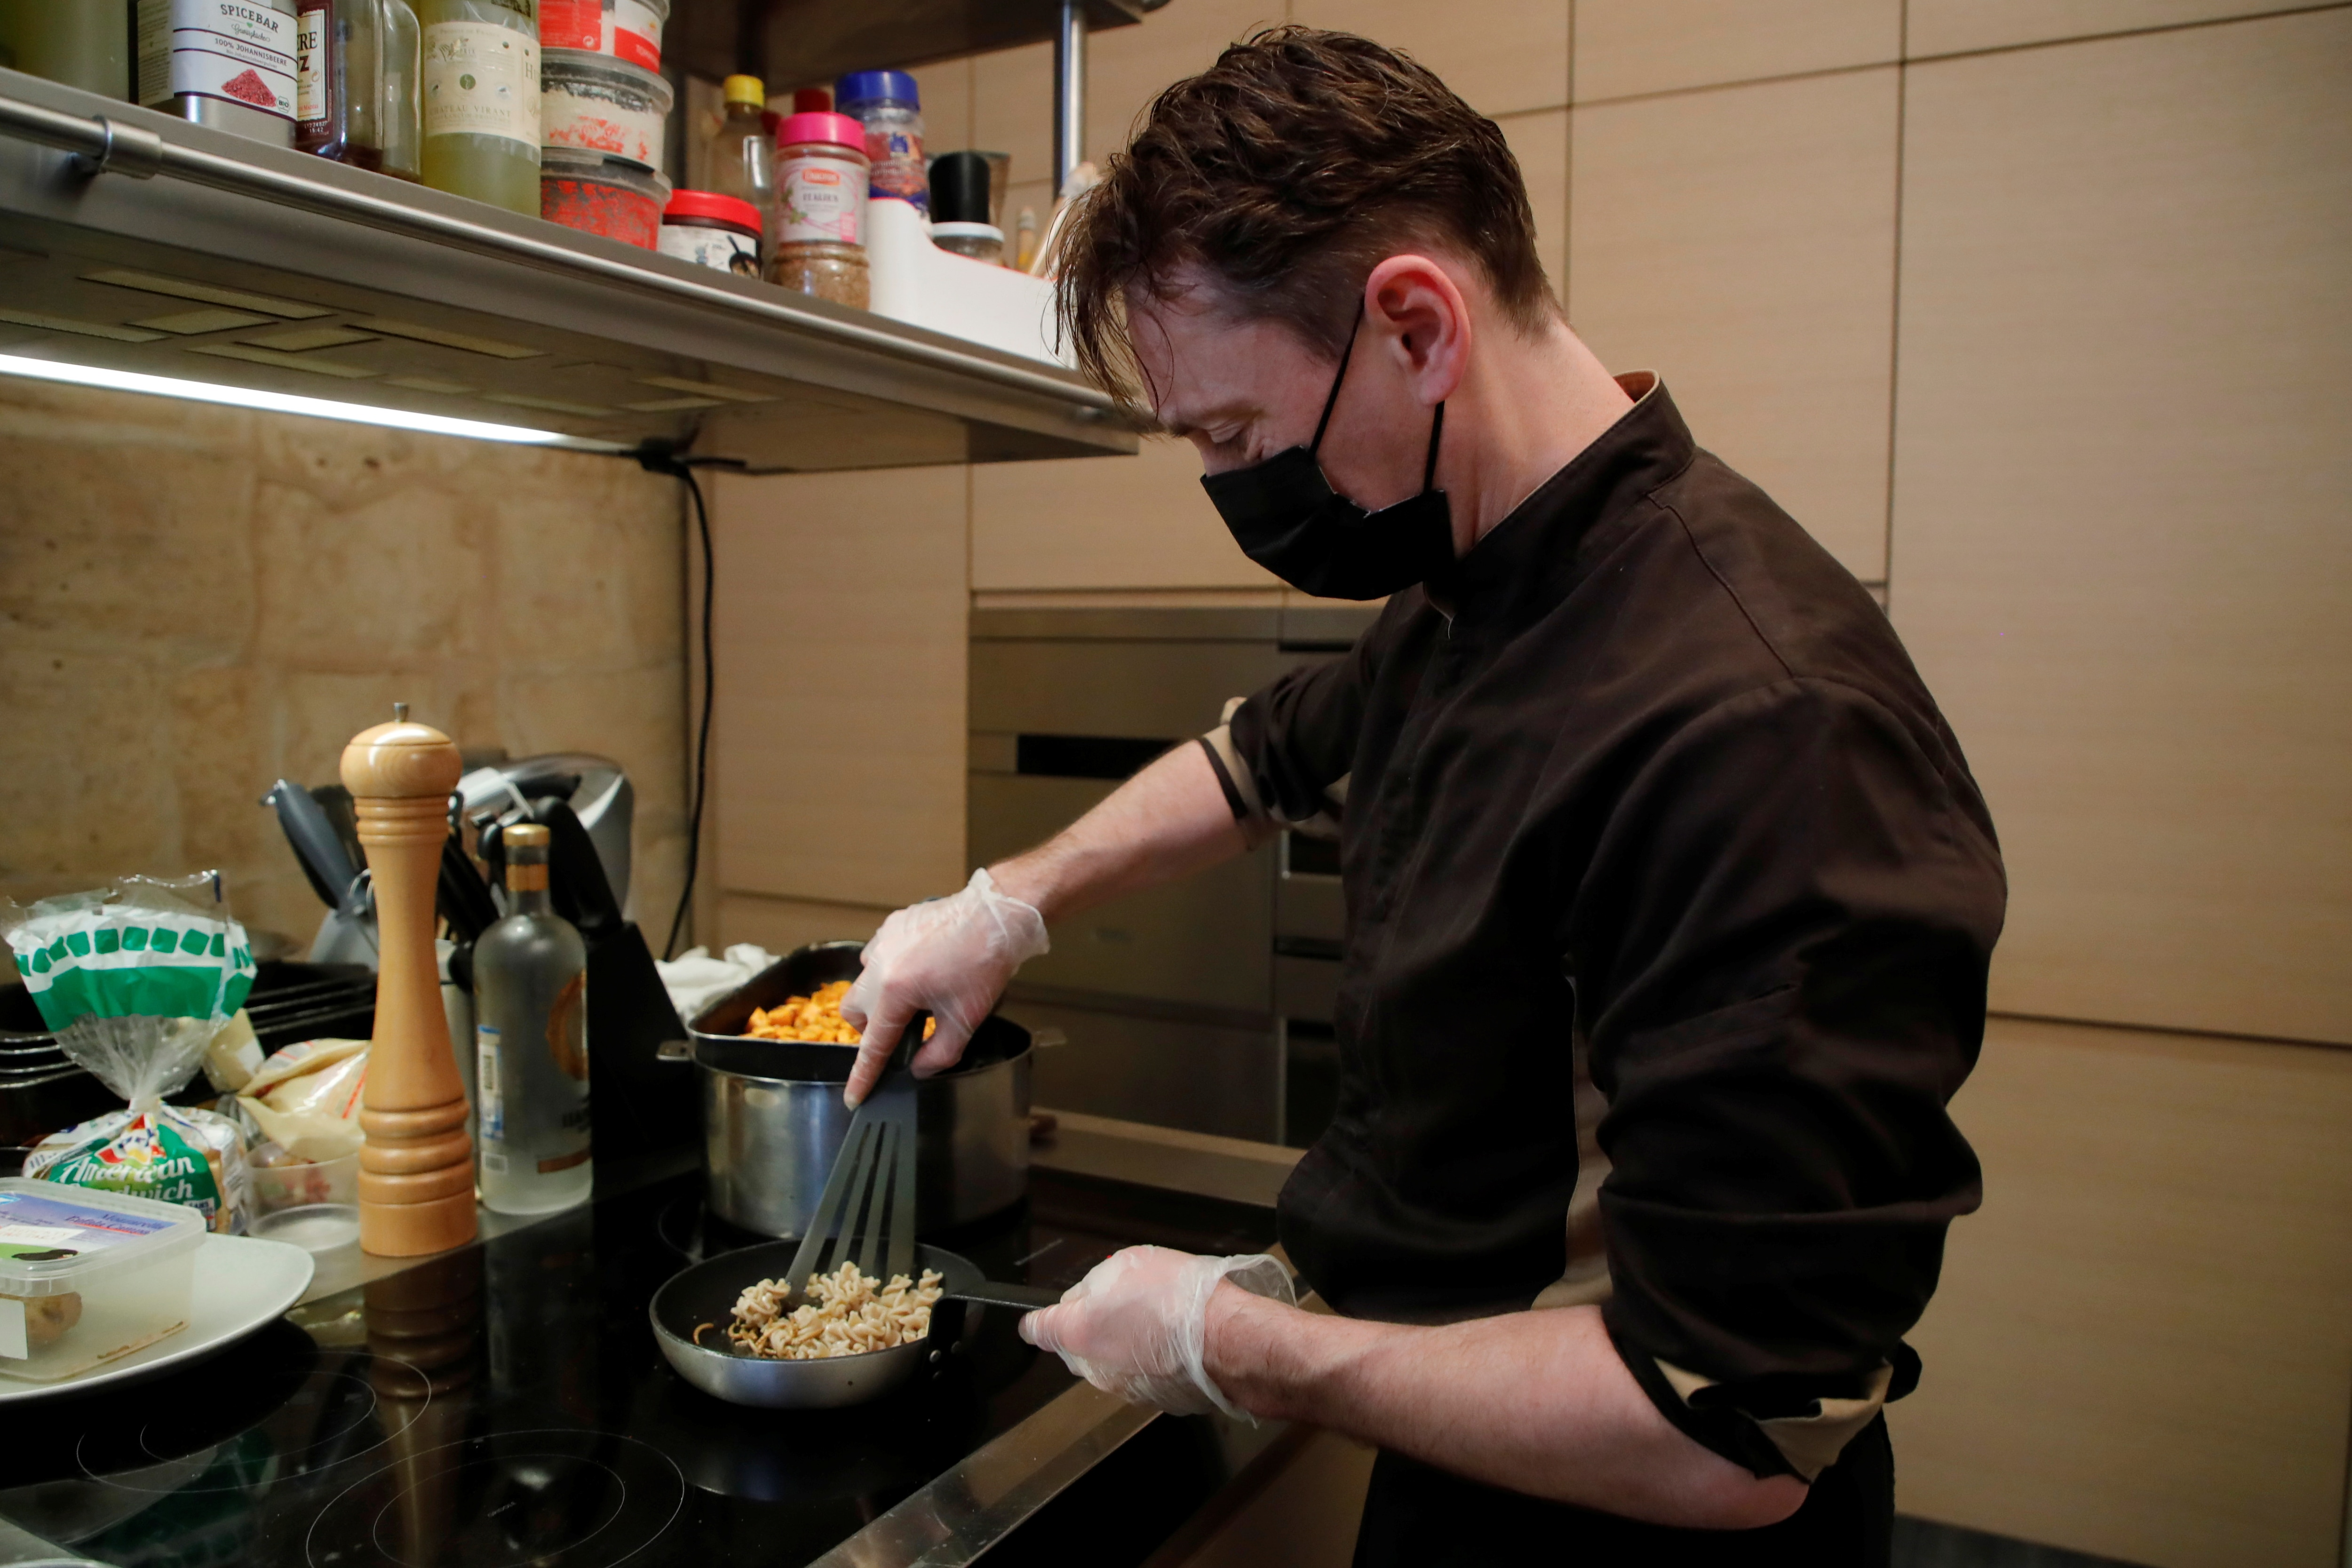 Koki Prancis Laurent Fett menyiapkan sepiring ulat goreng di restorannya, Inoveat, yang hanya menyajikan makanan berbahan serangga di Paris, Prancis (REUTERS)